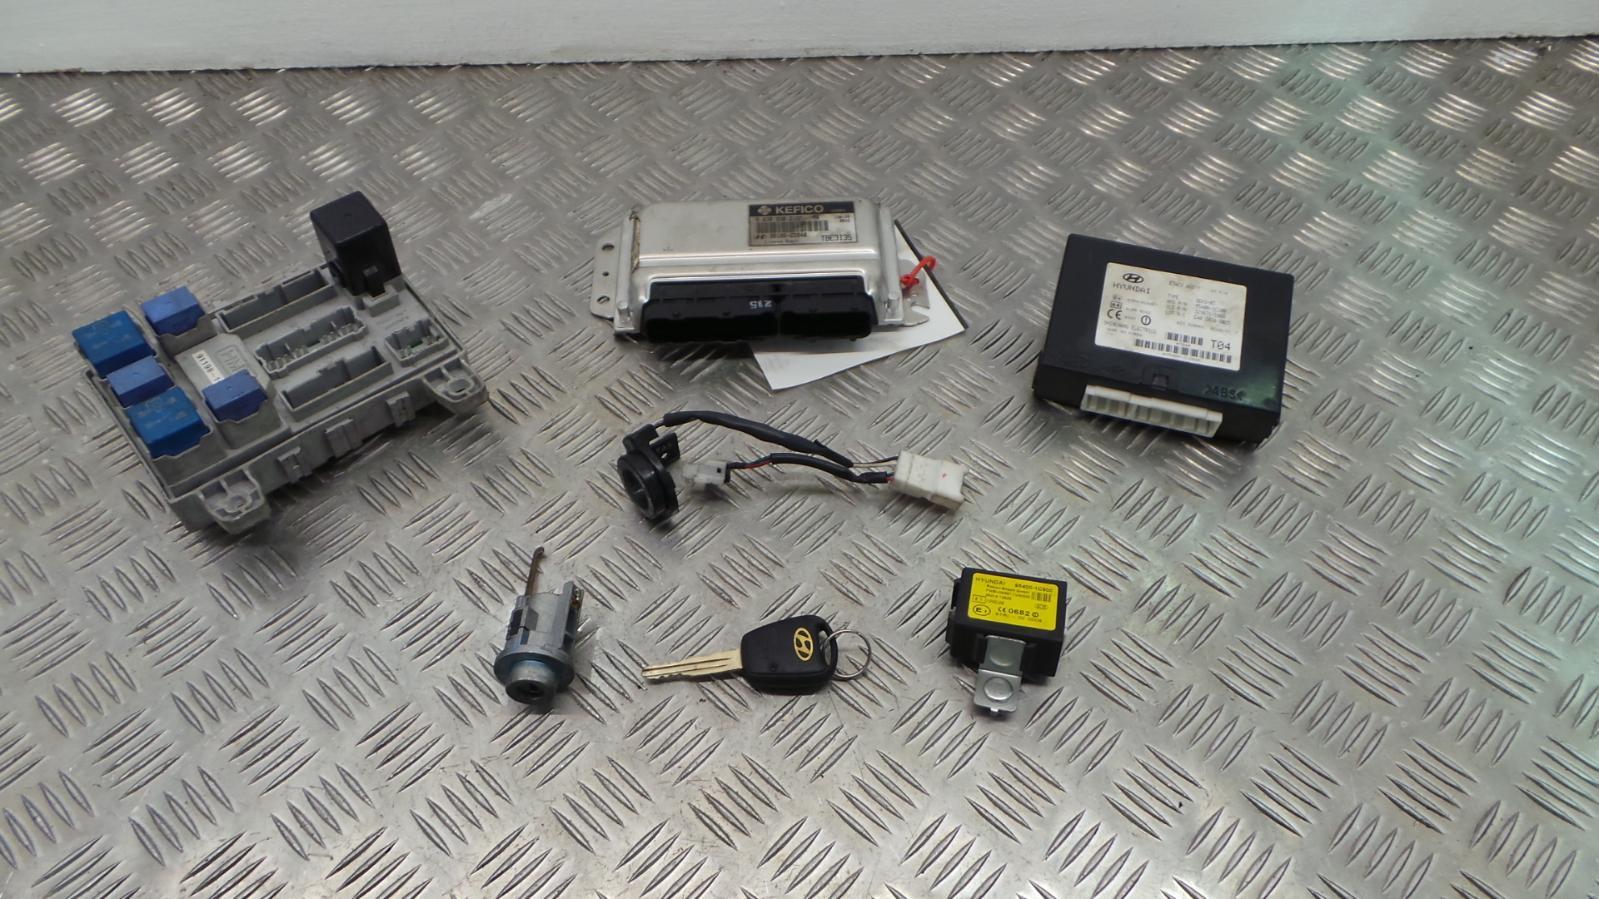 hight resolution of 2003 hyundai getz 1 3 petrol manual ignition kit engine ecu fuse box